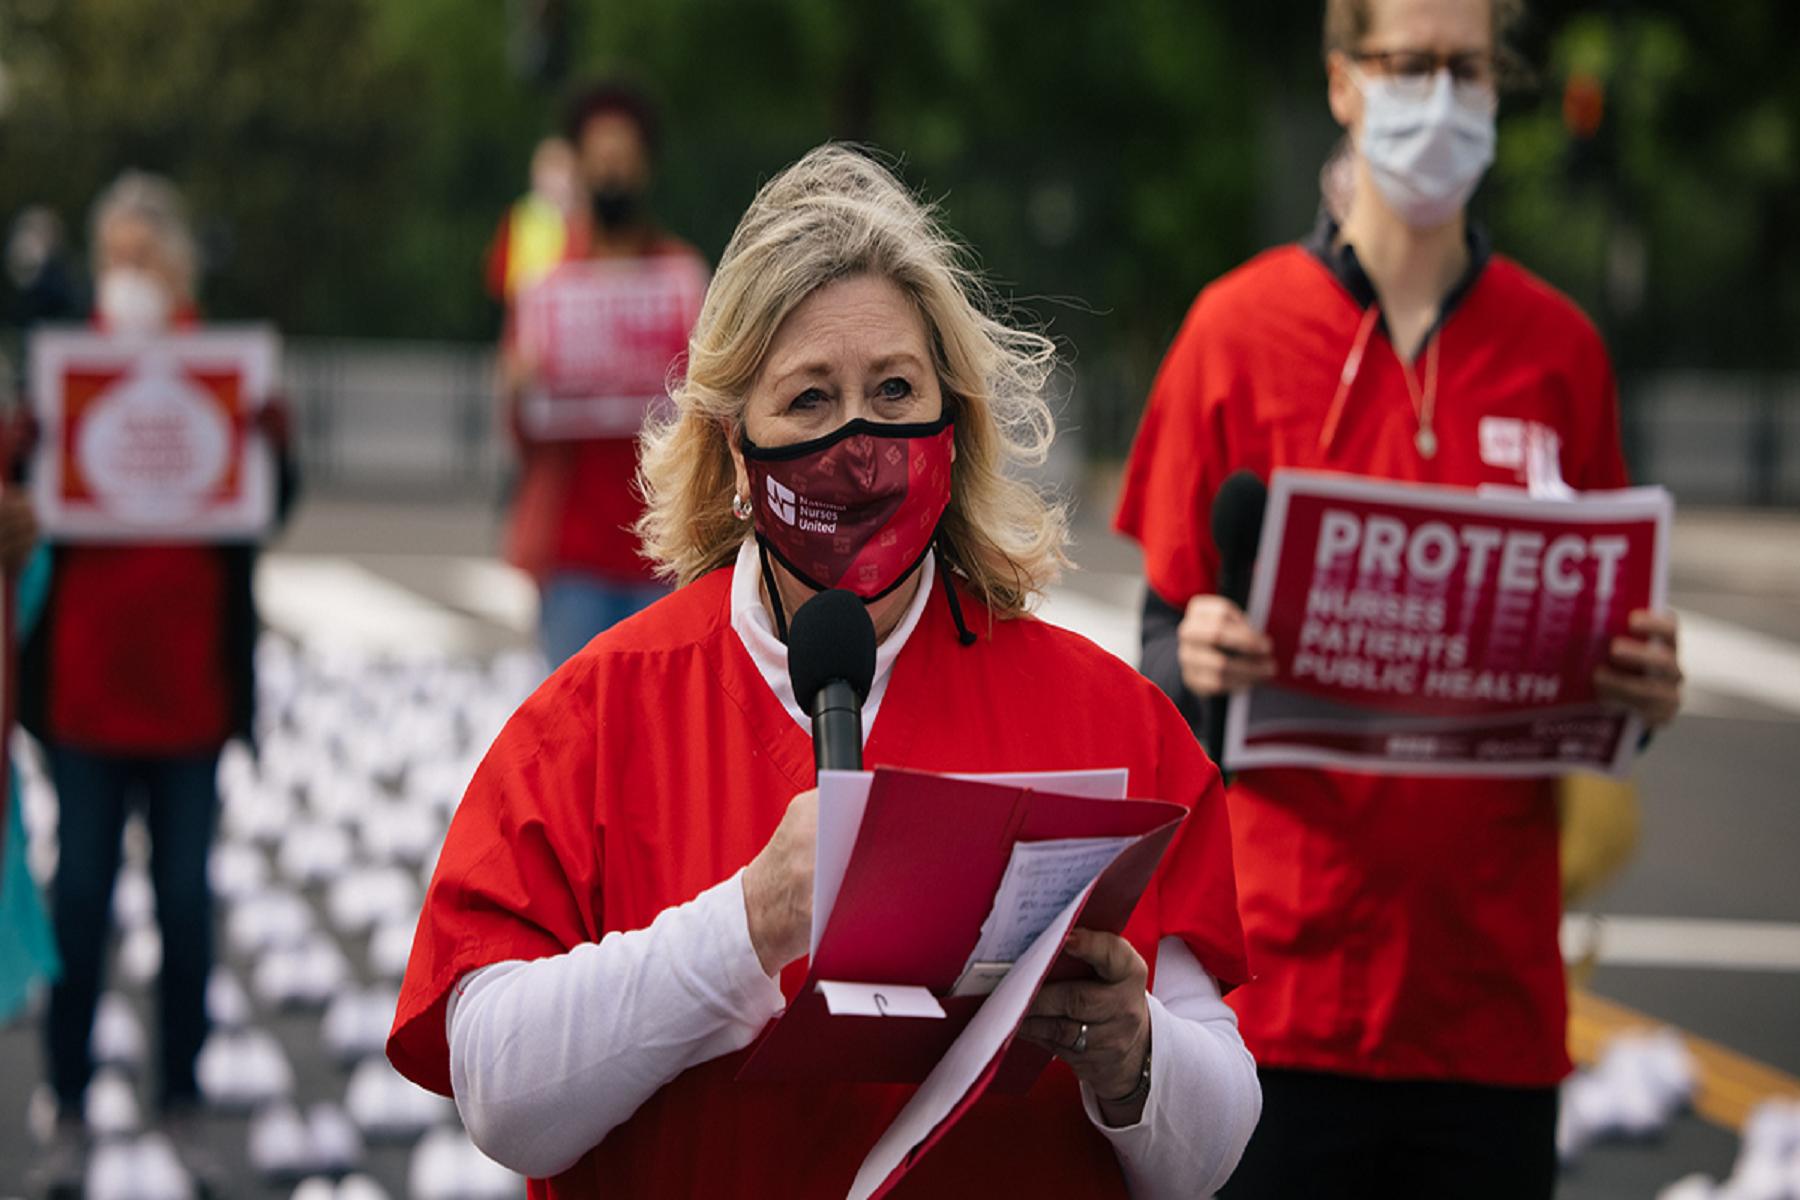 HΠΑ Κορωνοϊός: Η μεγαλύτερη Ένωση Νοσοκόμων των ΗΠΑ σχίζει τις νέες οδηγίες των CDC για τις μάσκες